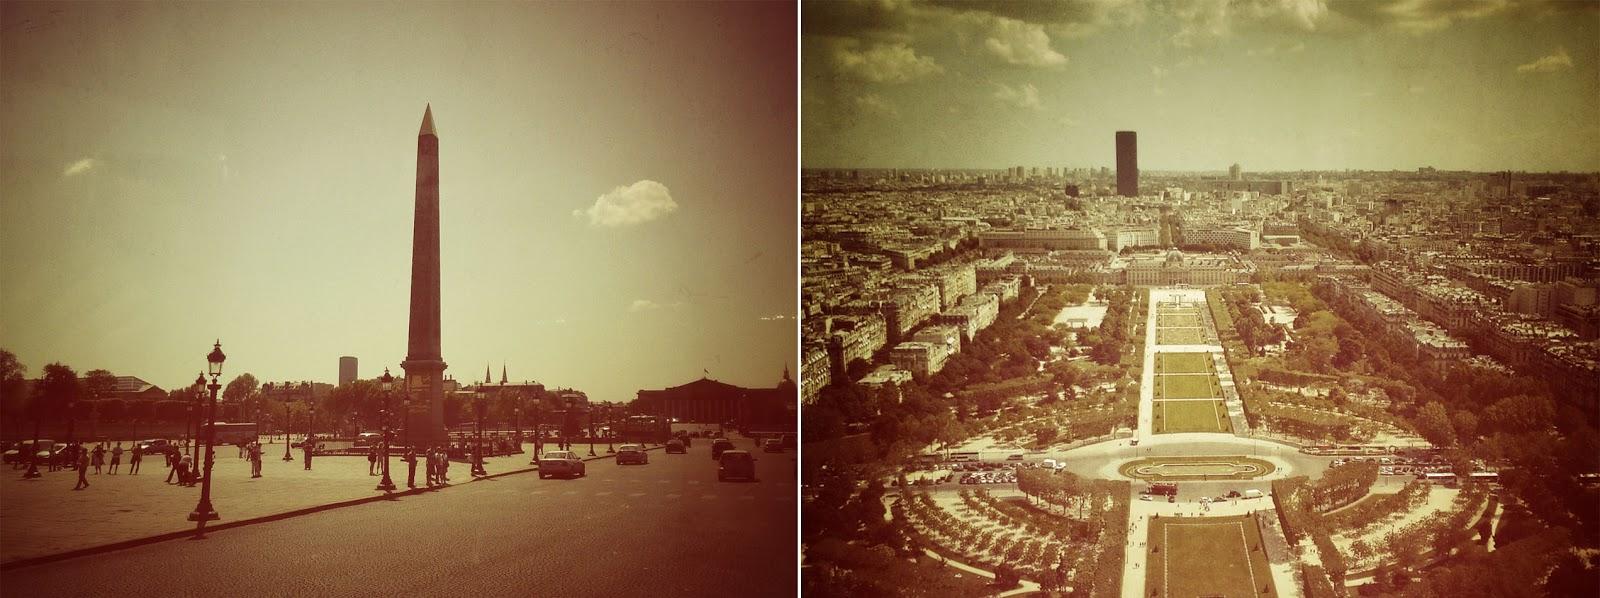 Paris, Europe, Obelisk, Eiffel tower, view, Travel, blog